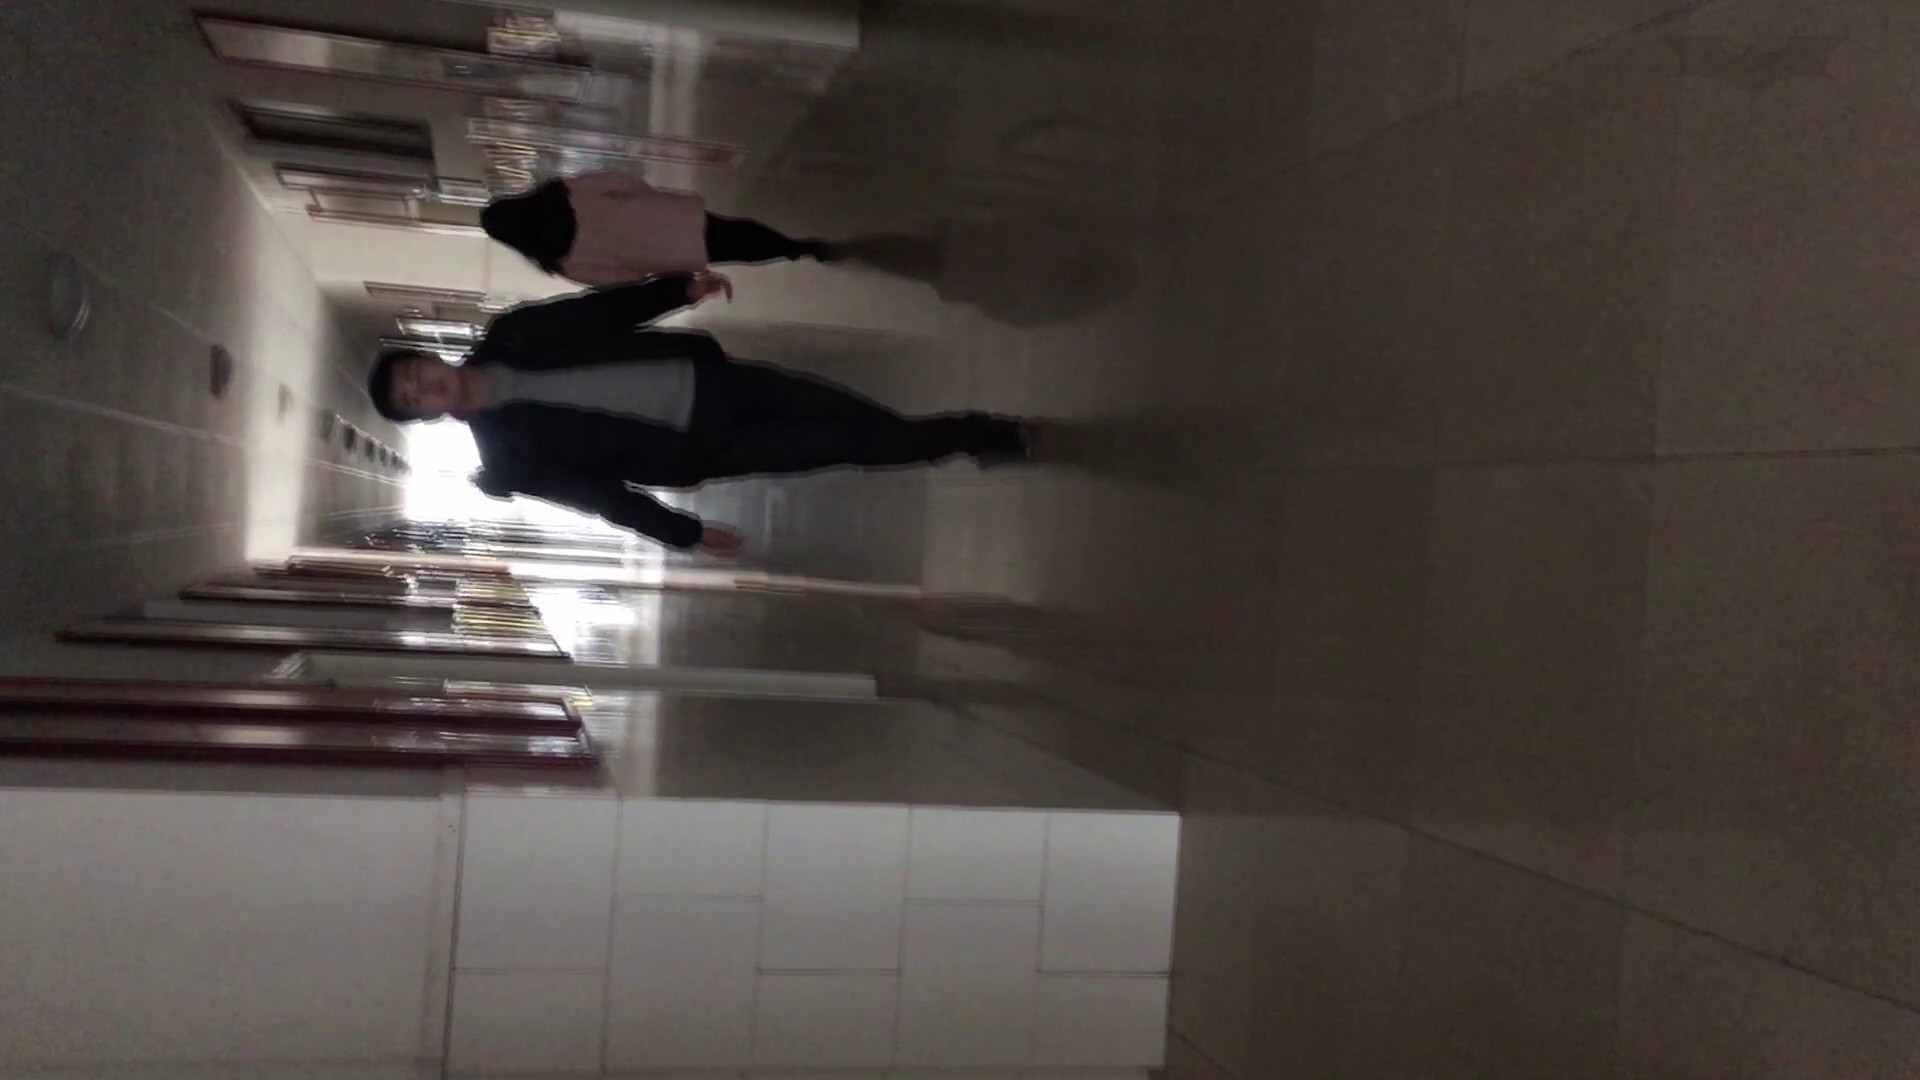 芸術大学ガチ潜入盗撮 JD盗撮 美女の洗面所の秘密 Vol.80 洗面所シーン  53画像 12